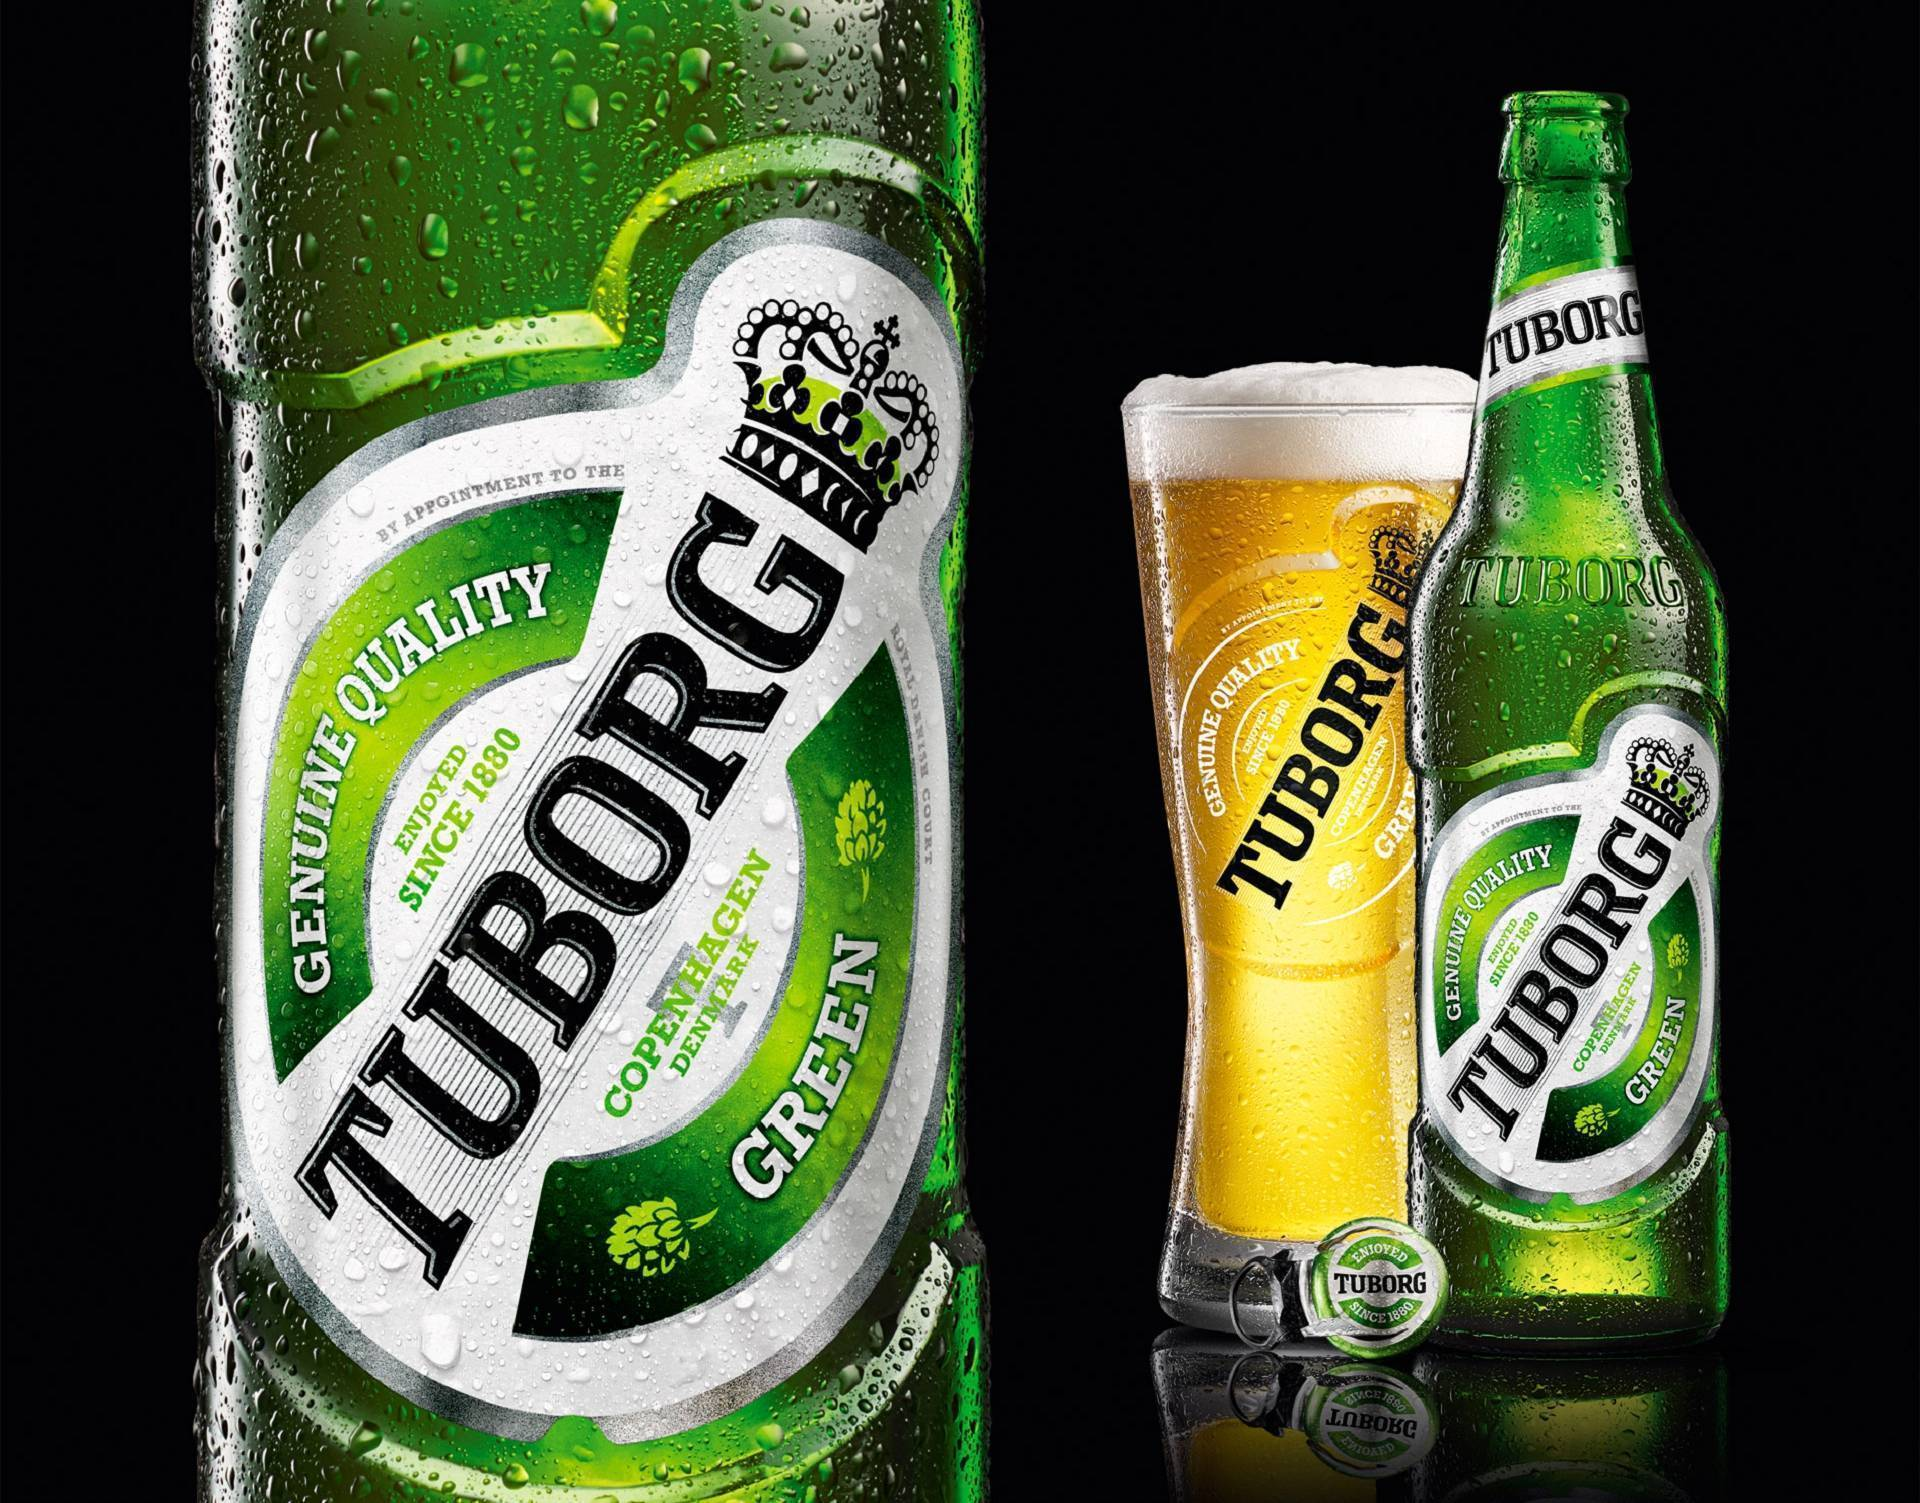 Пиво туборг: производитель, крепость tuborg green, состав, виды